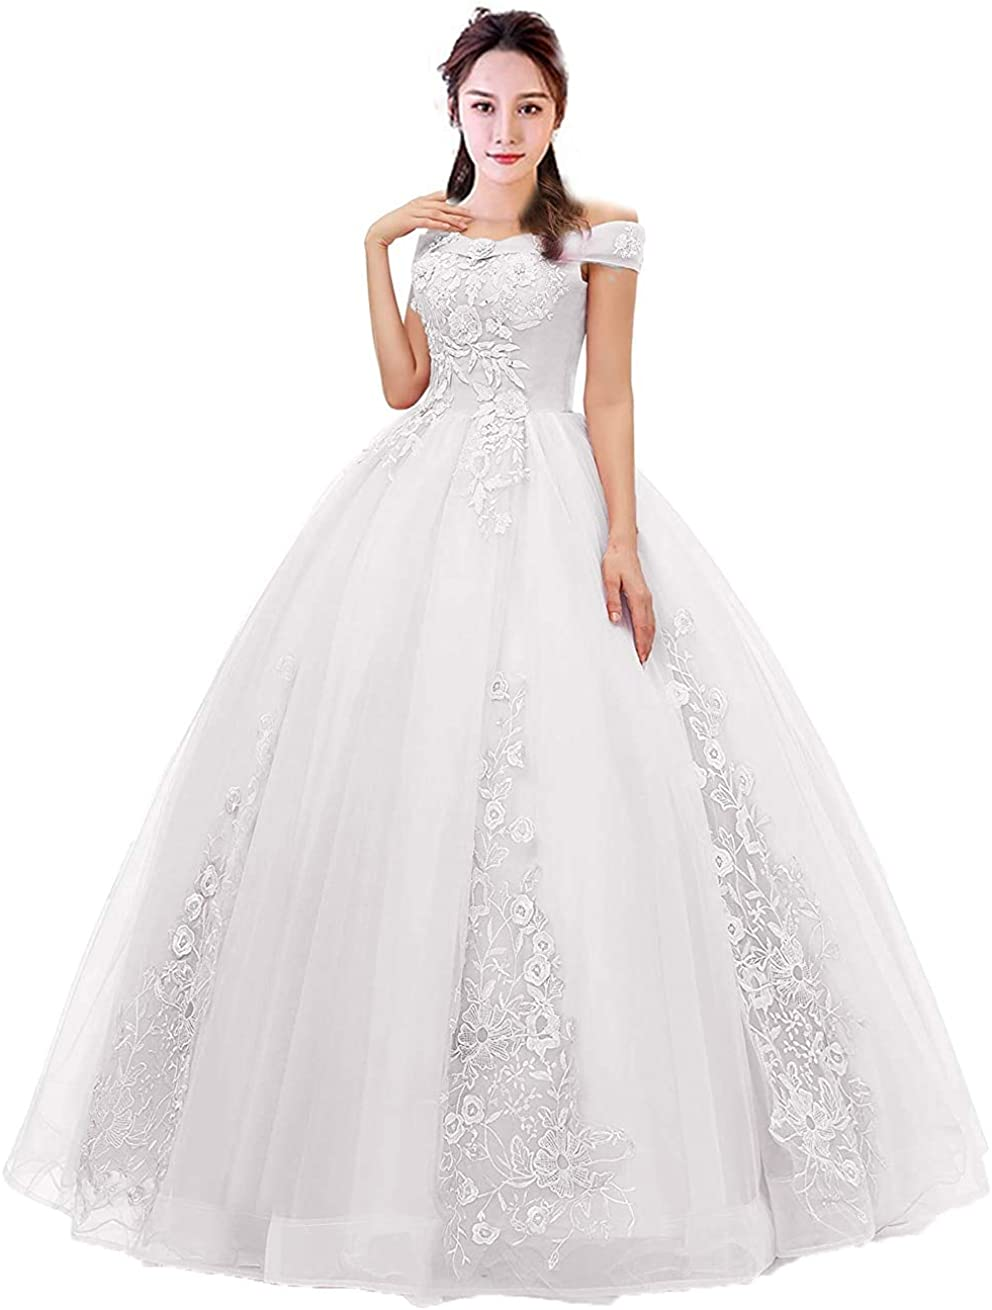 Diandiai Sweetheart Charlotte Mall Year-end gift Quinceanera Dress Beads Ball Ruffles Gown Pr